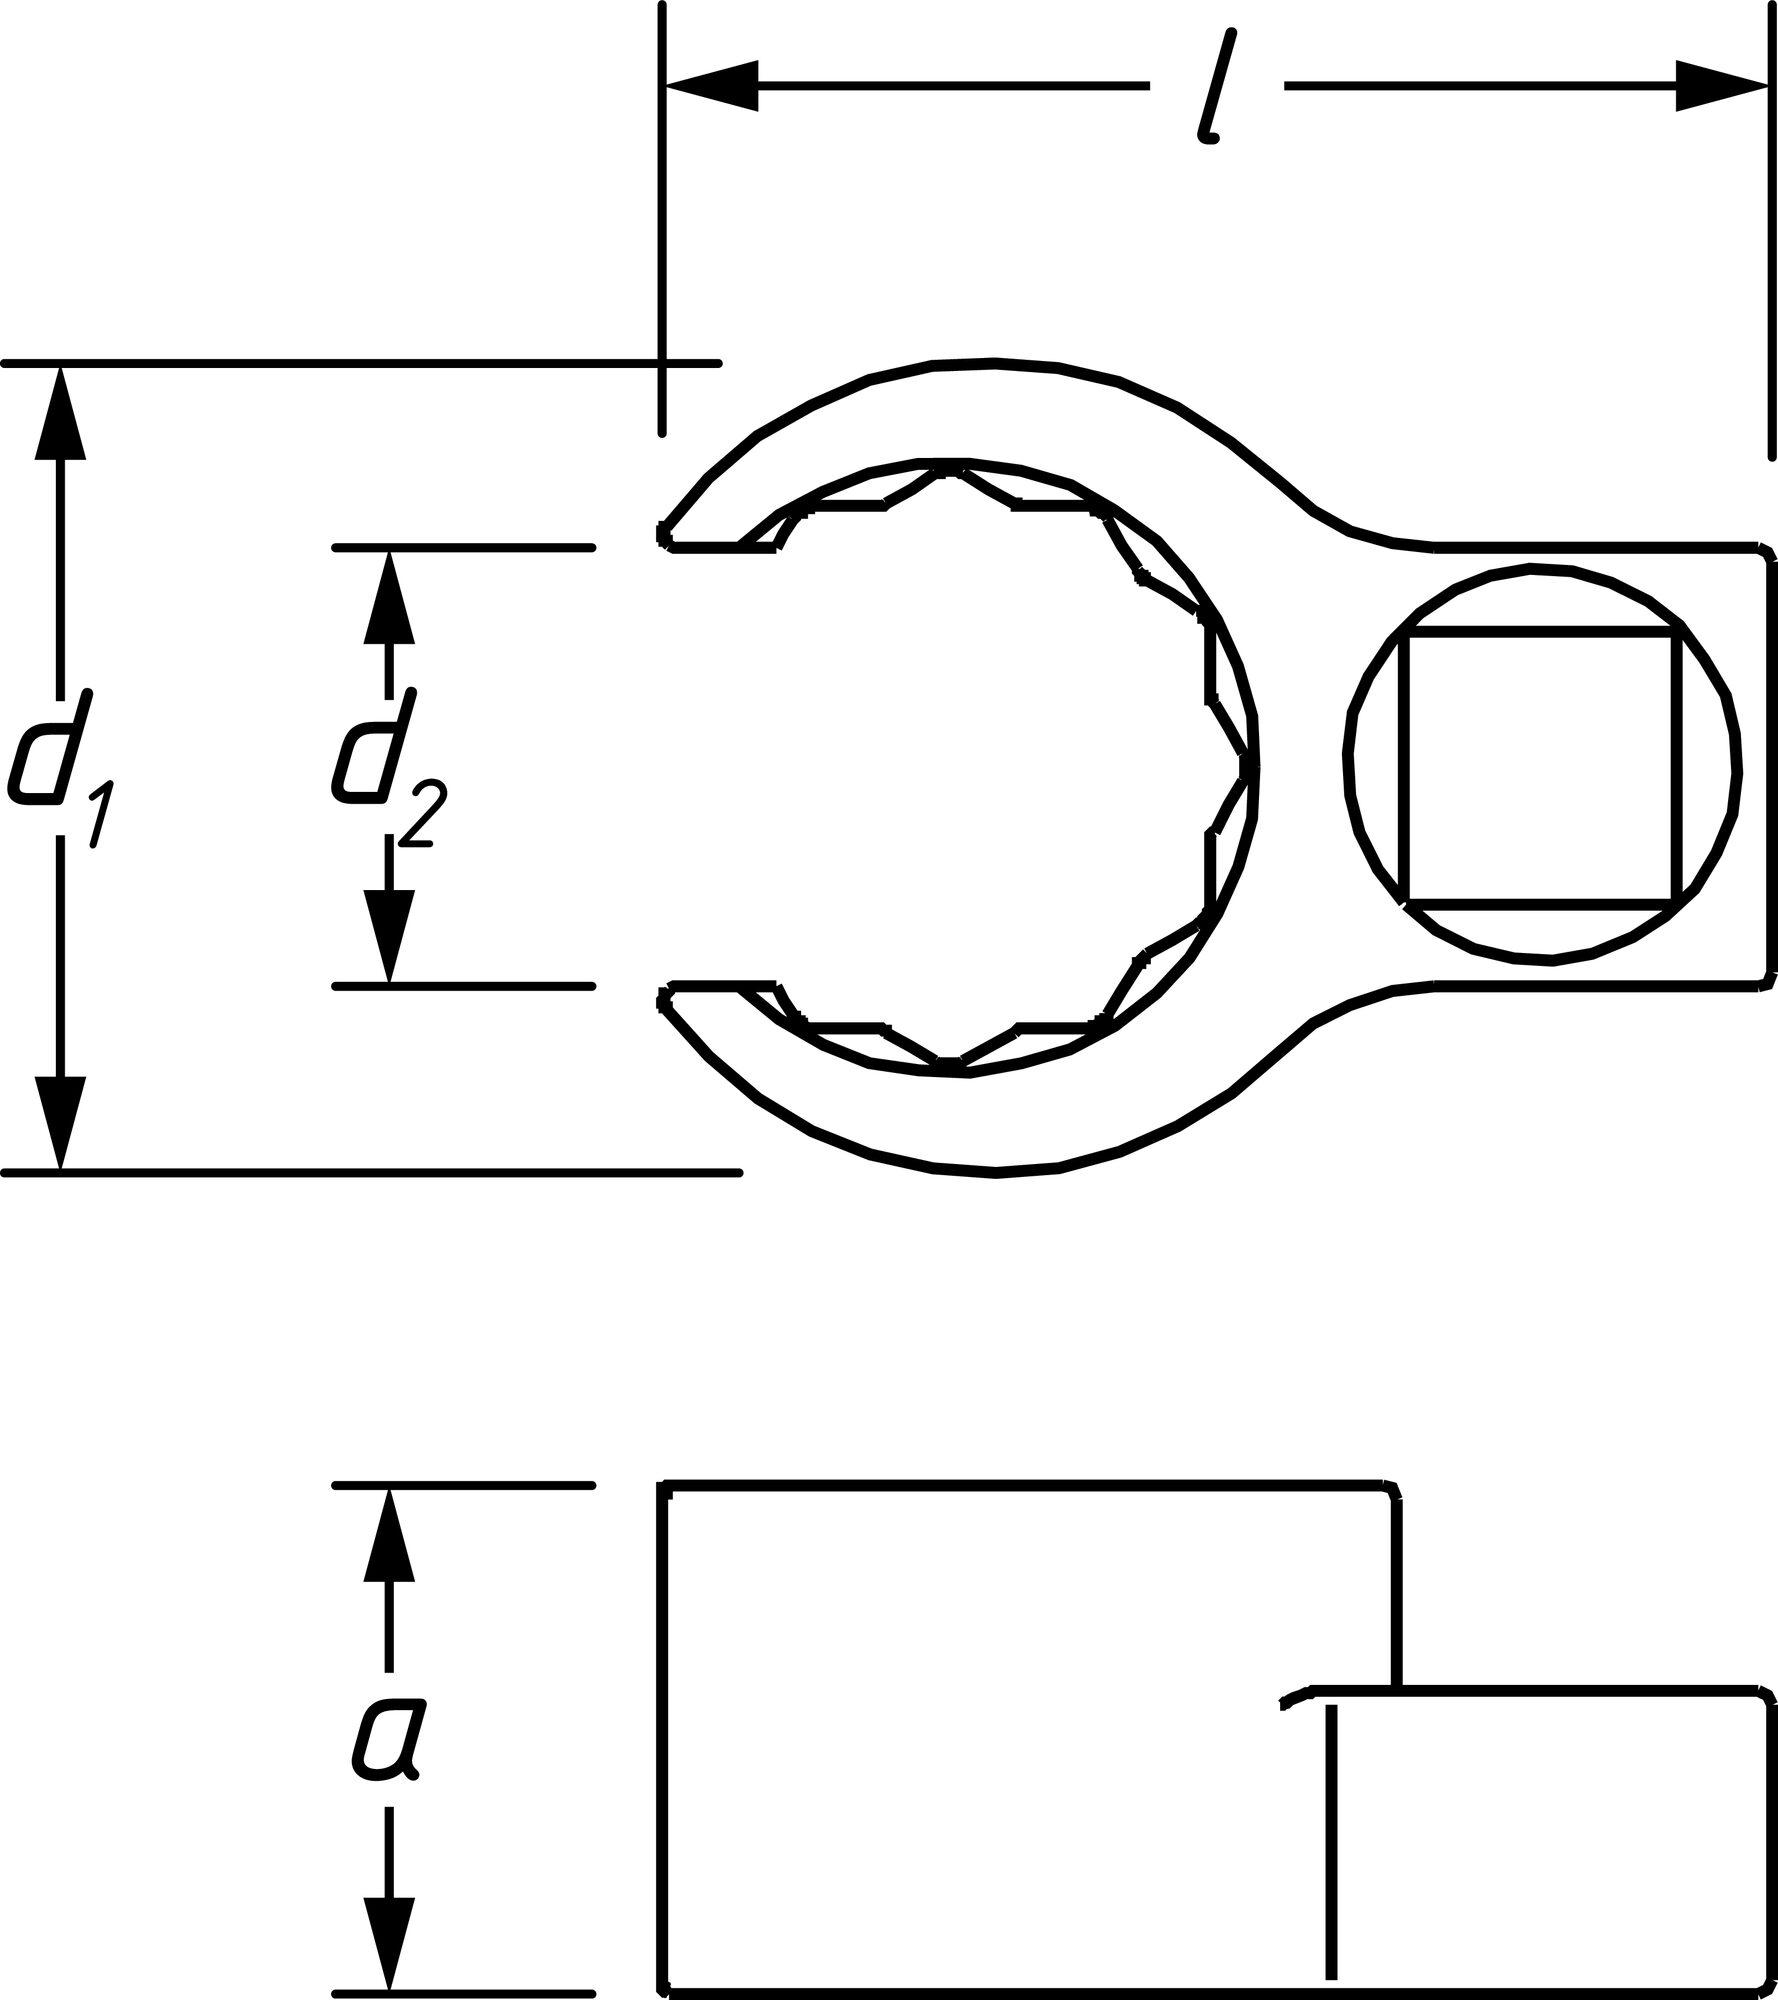 HAZET Ringschlüssel ∙ Doppelsechskant ∙ offen 848Z-24 ∙ Vierkant hohl 10 mm (3/8 Zoll) ∙ 24 mm